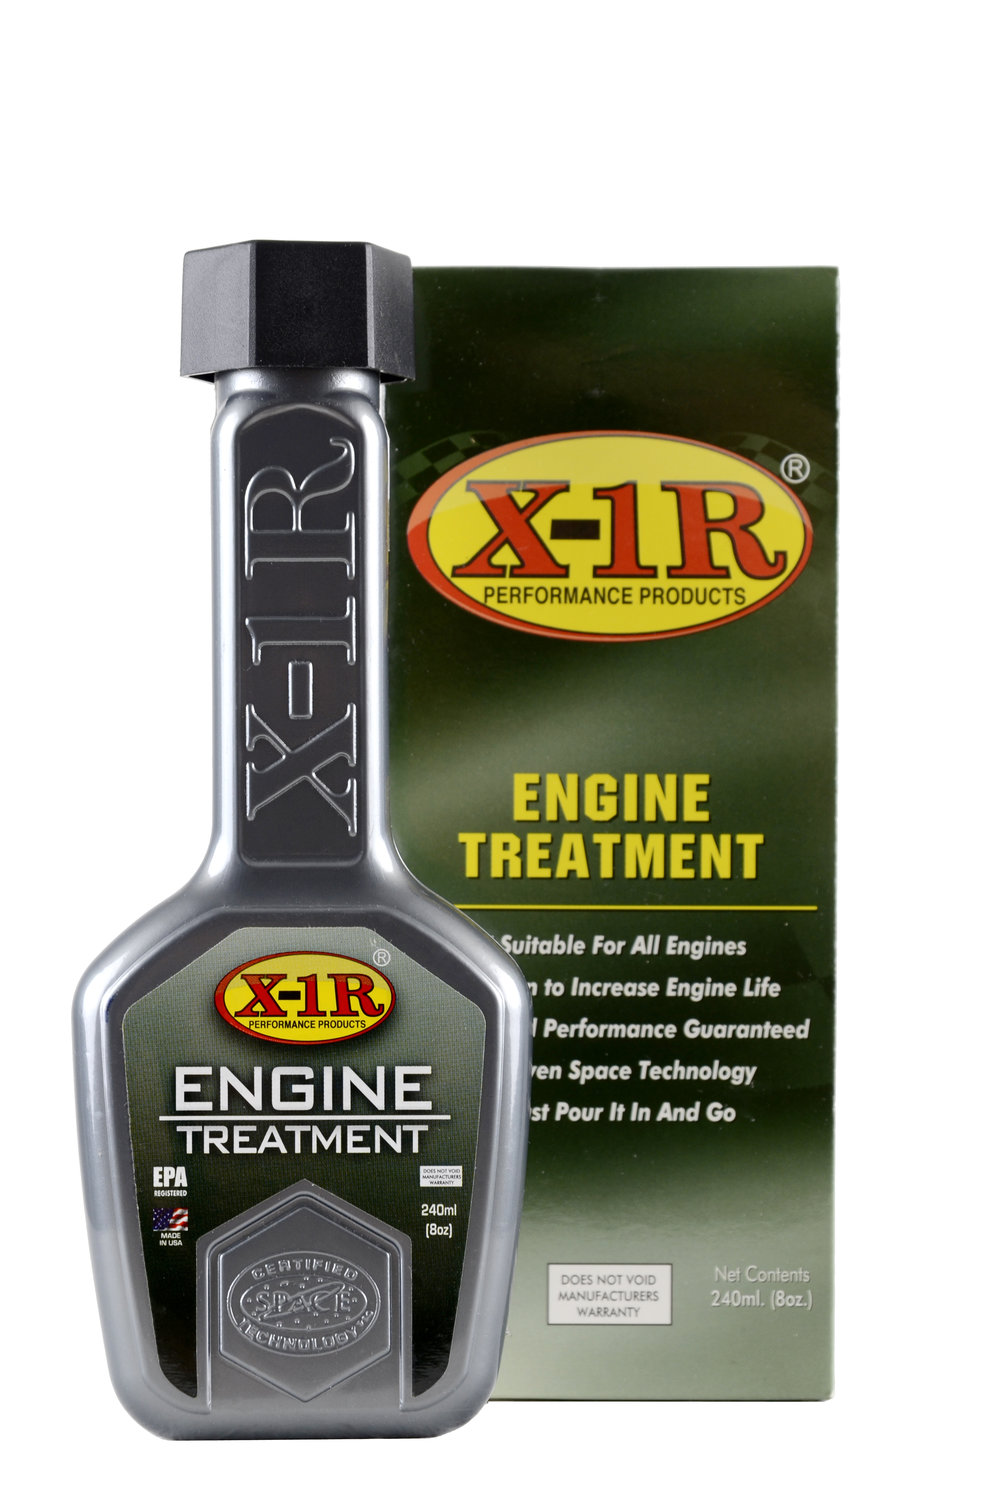 Engine Oil Treatment